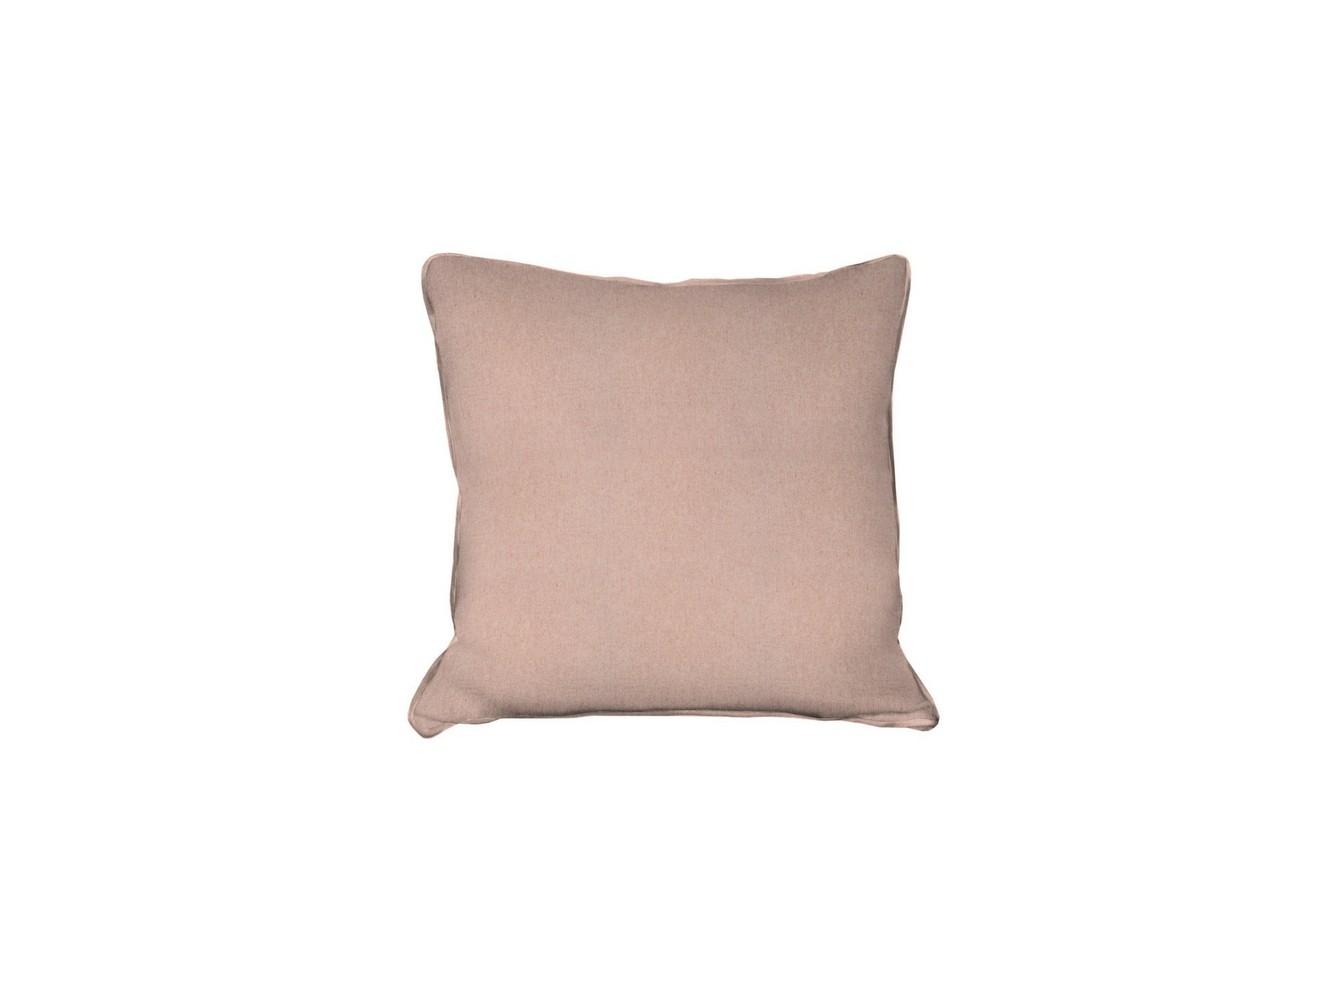 Extra Scatter Cushions - Fabric Rose Quartz